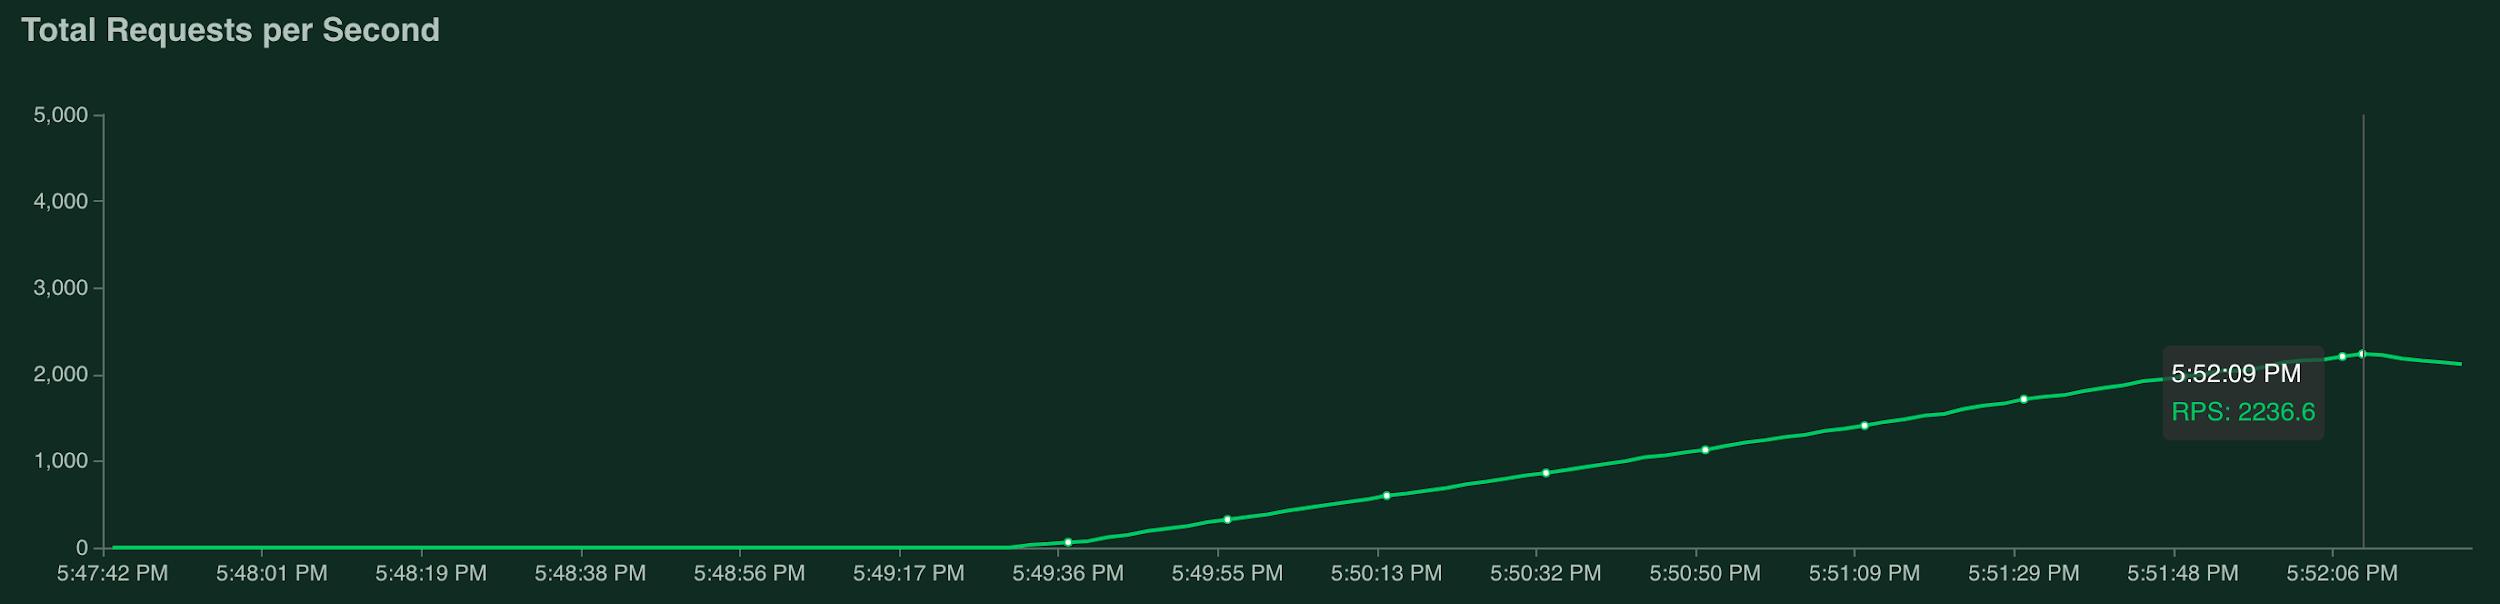 Grafo que muestra 2236.6 solicitudes por segundo